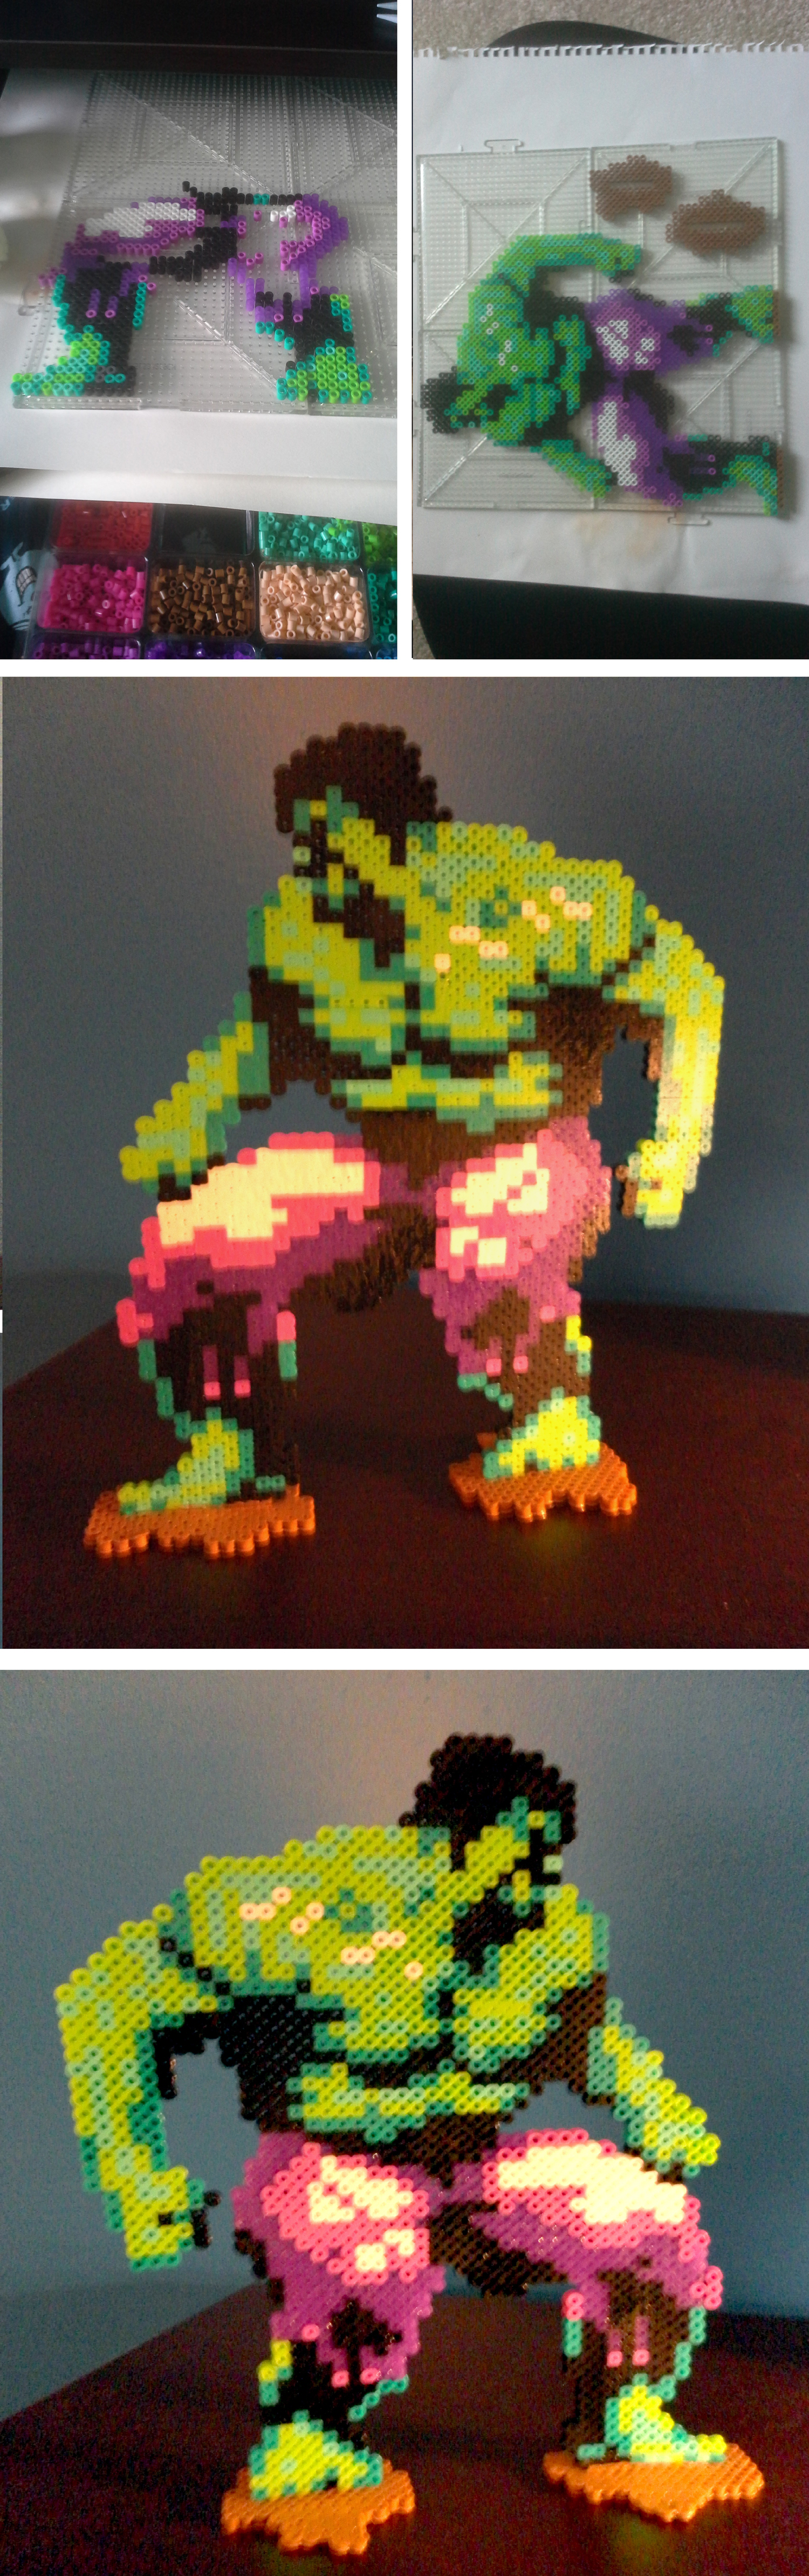 Pixel Hulk made out of Perler Beads